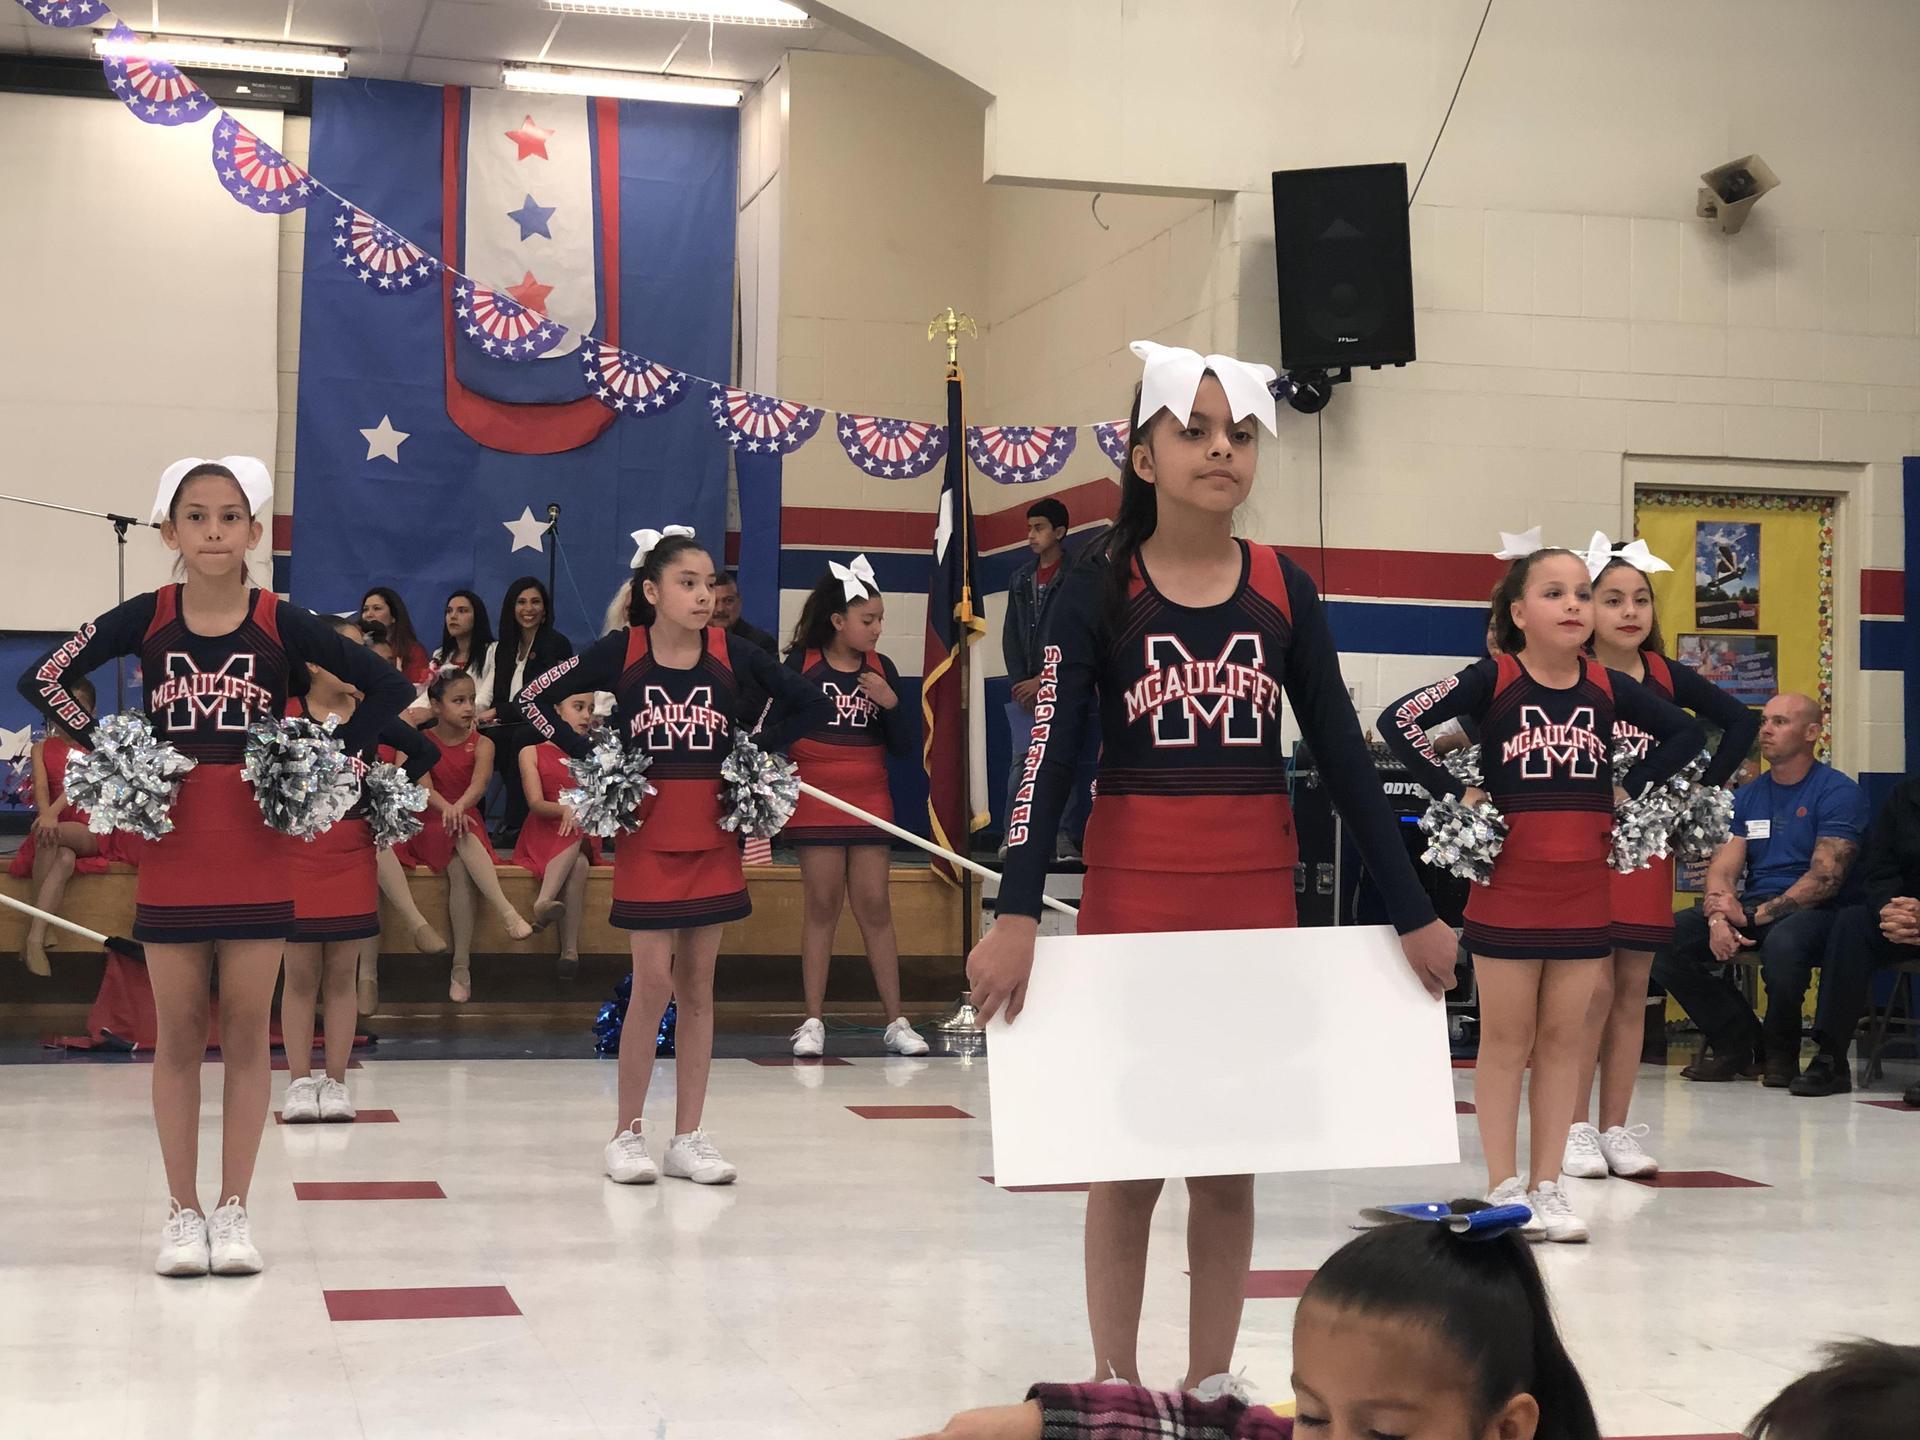 cheering on the floor